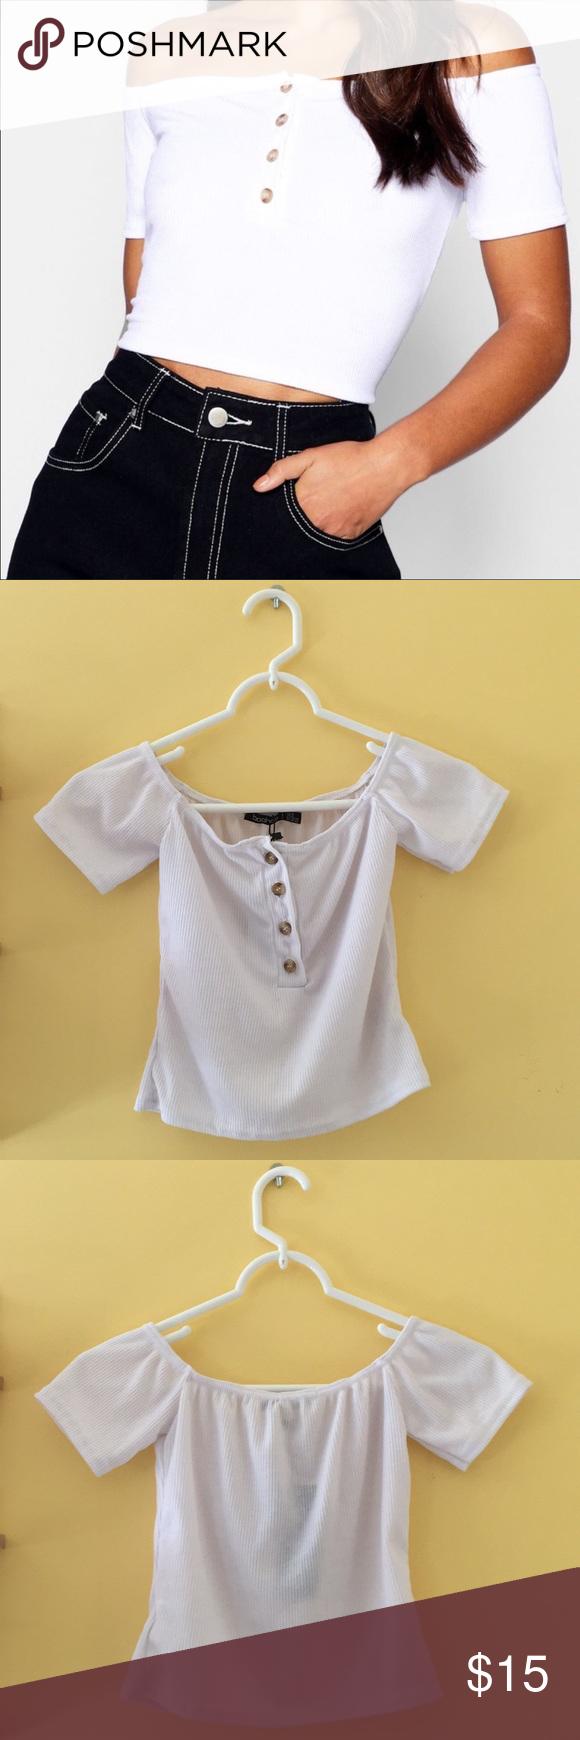 d69935c4d93c9d Boohoo Petite White Bardot Crop Top New w tags Comfortable